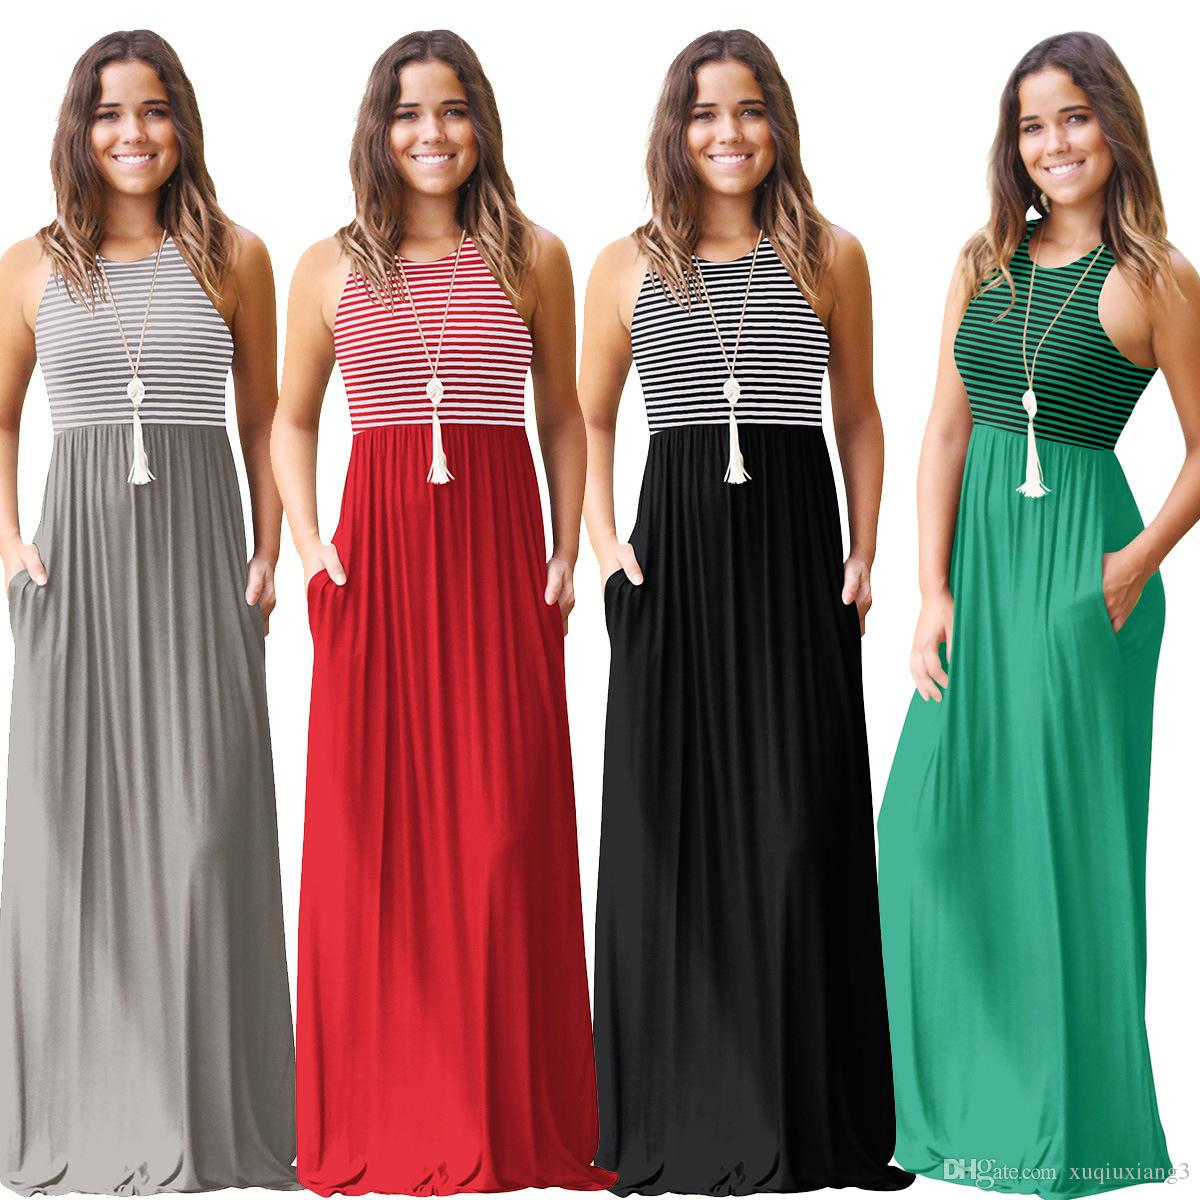 533d76e39d Women Summer Beach Boho Maxi Dress 2018 High Quality Brand Striped Print  Long Dresses Feminine Plus Size Vintage Cocktail Dresses Womens Formal  Dresses From ...